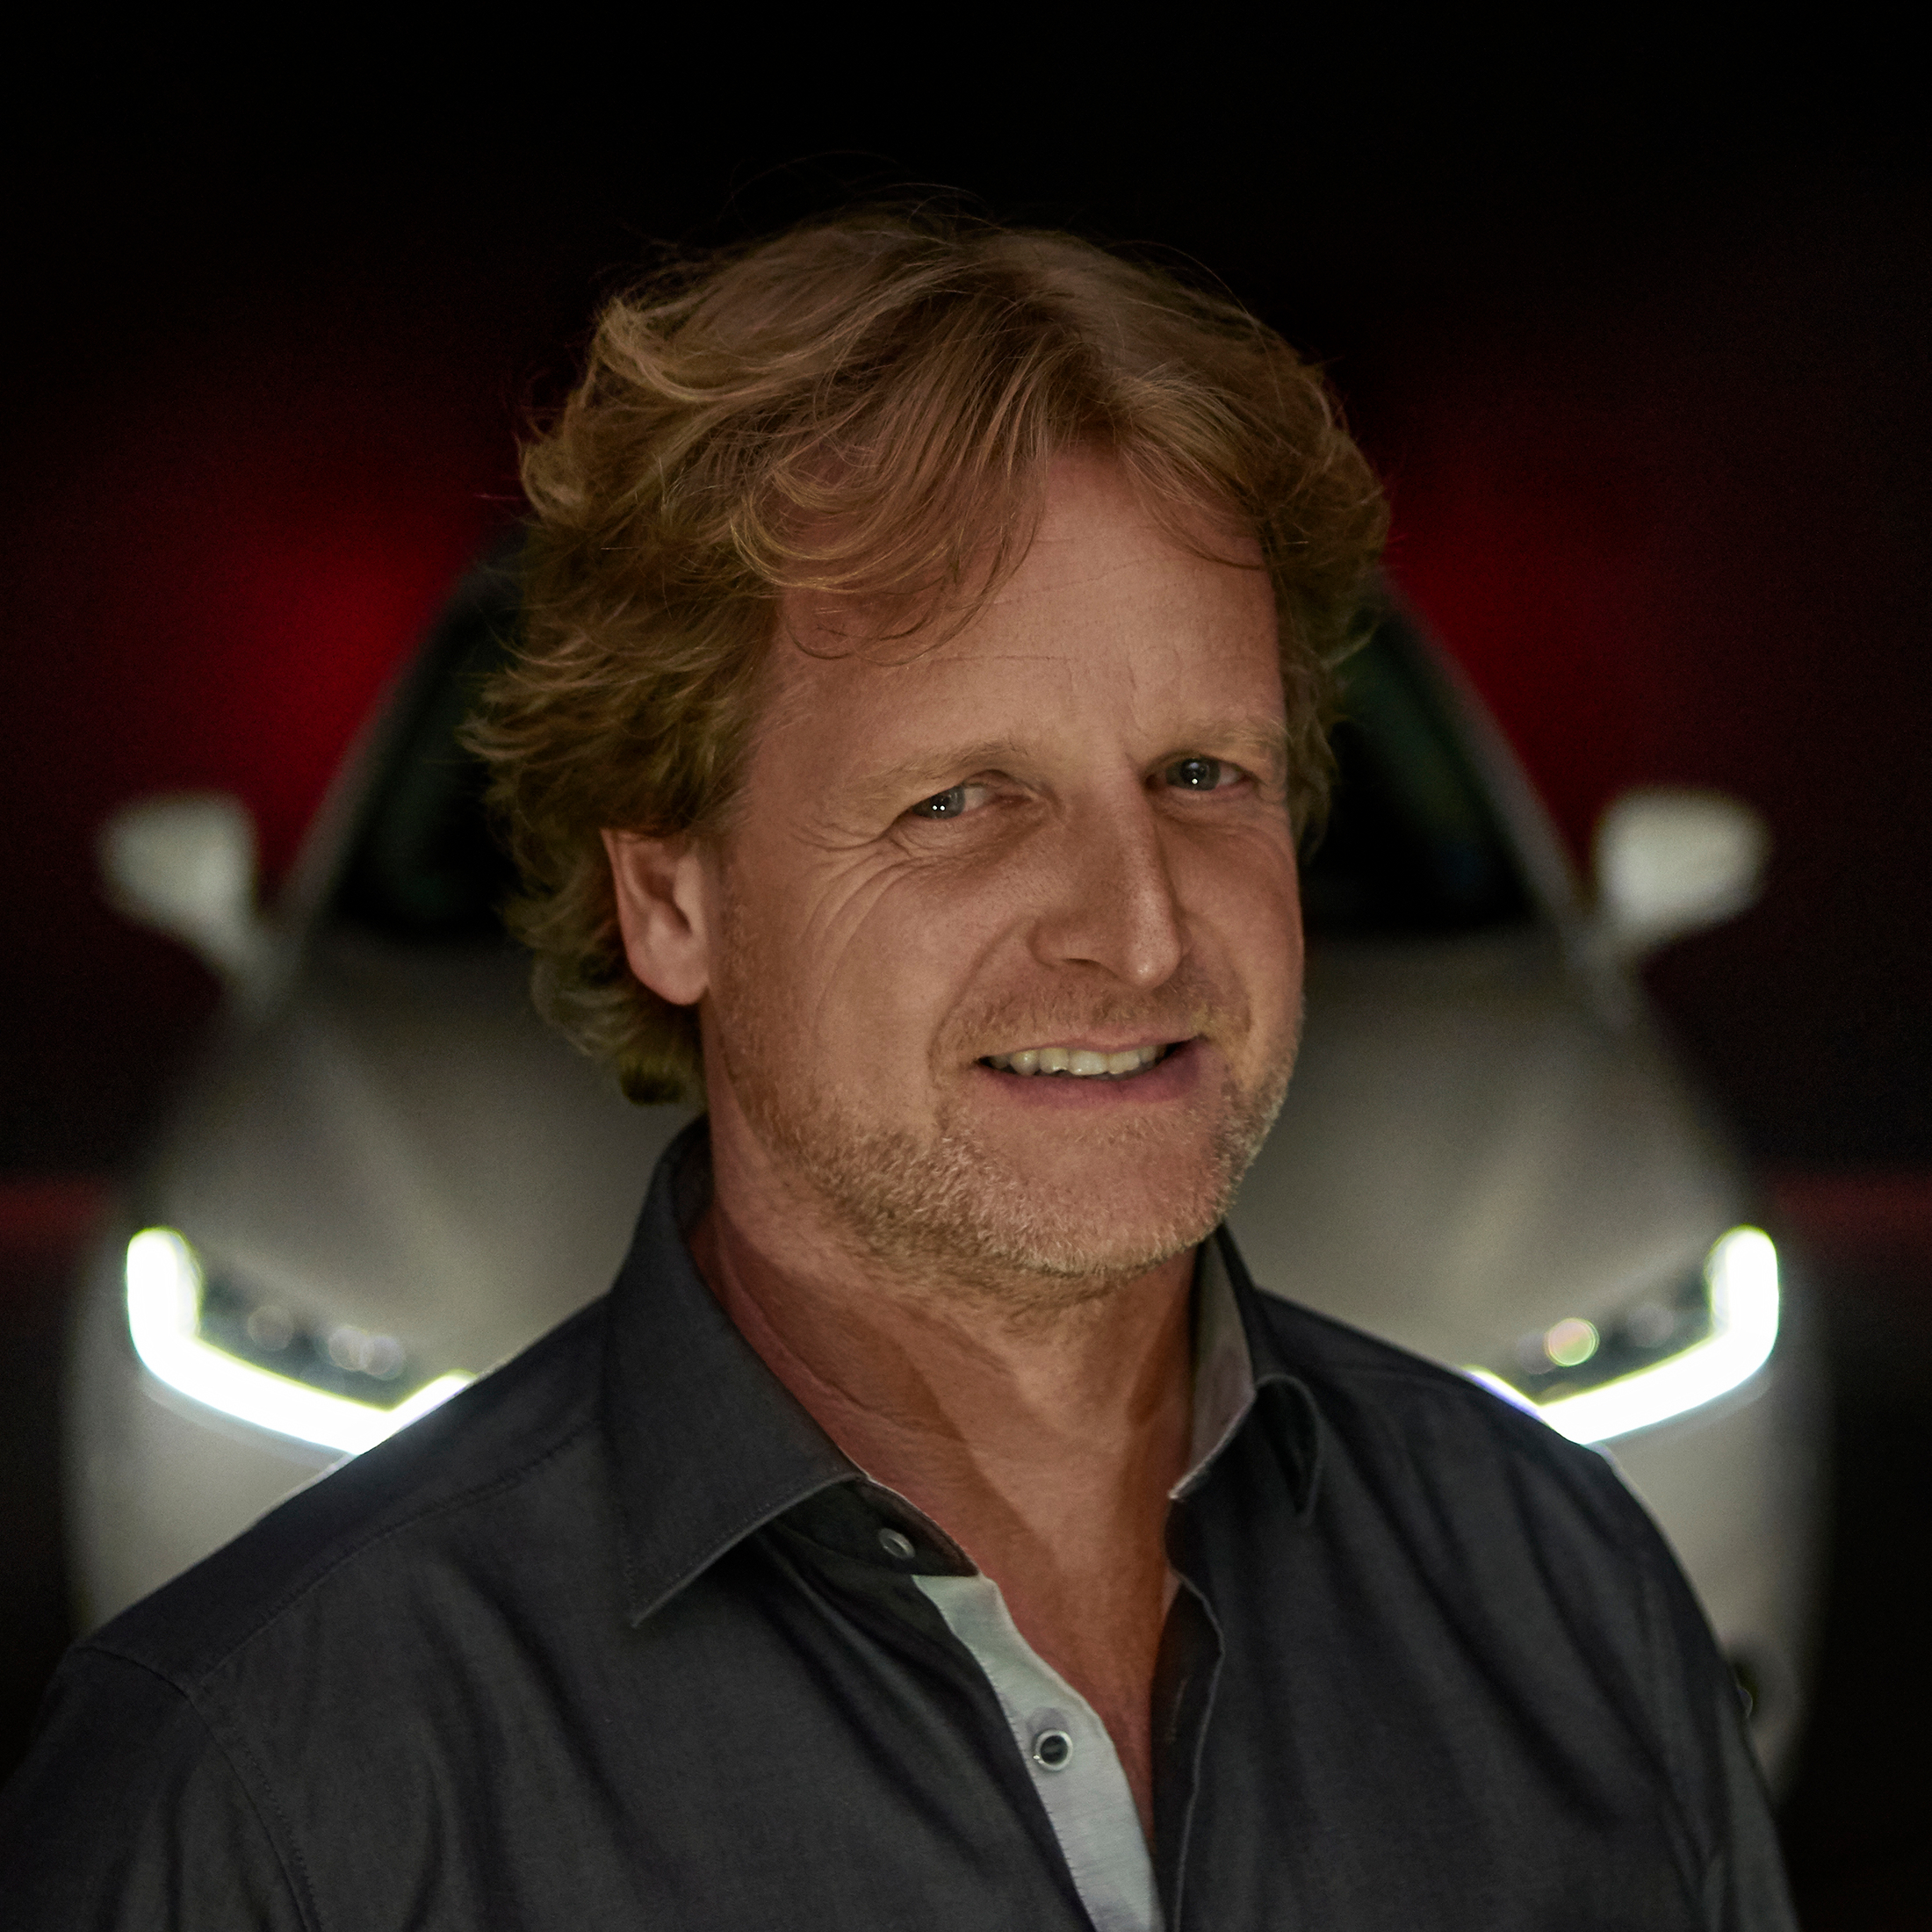 Michael Koherr, Reserach Engineer - Advanced Lighting at FORD Werke GmbH, Germany